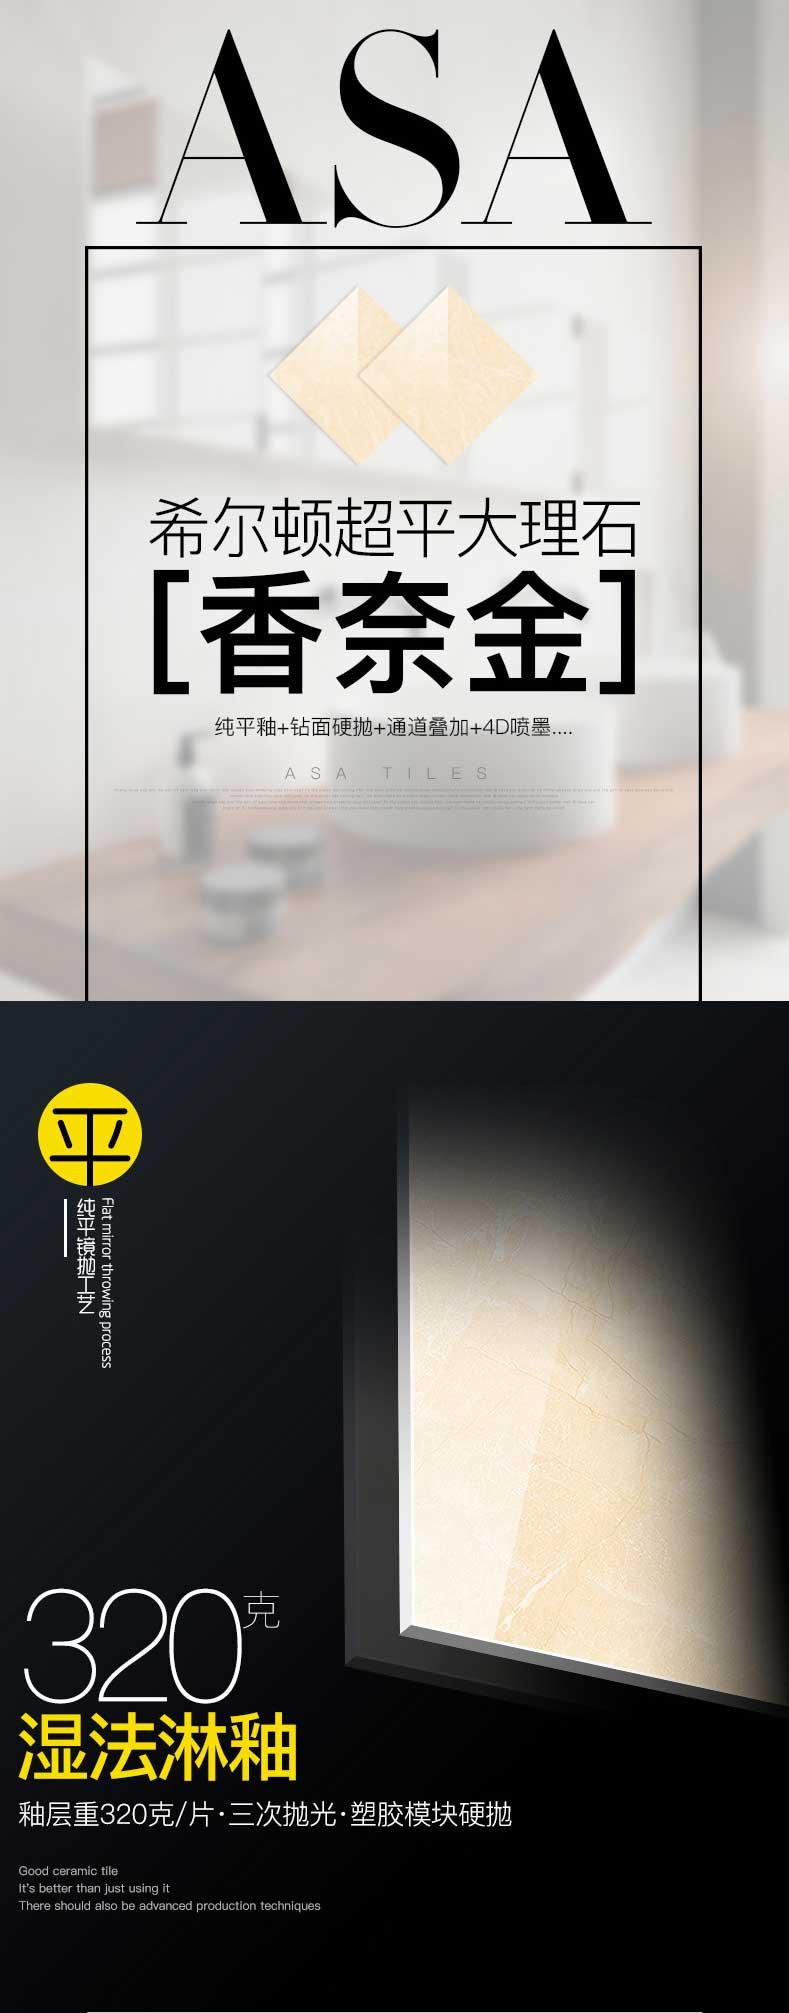 �����瓷◆�u-客�d防滑地�u�u香奈金-AH80062_01.jpg